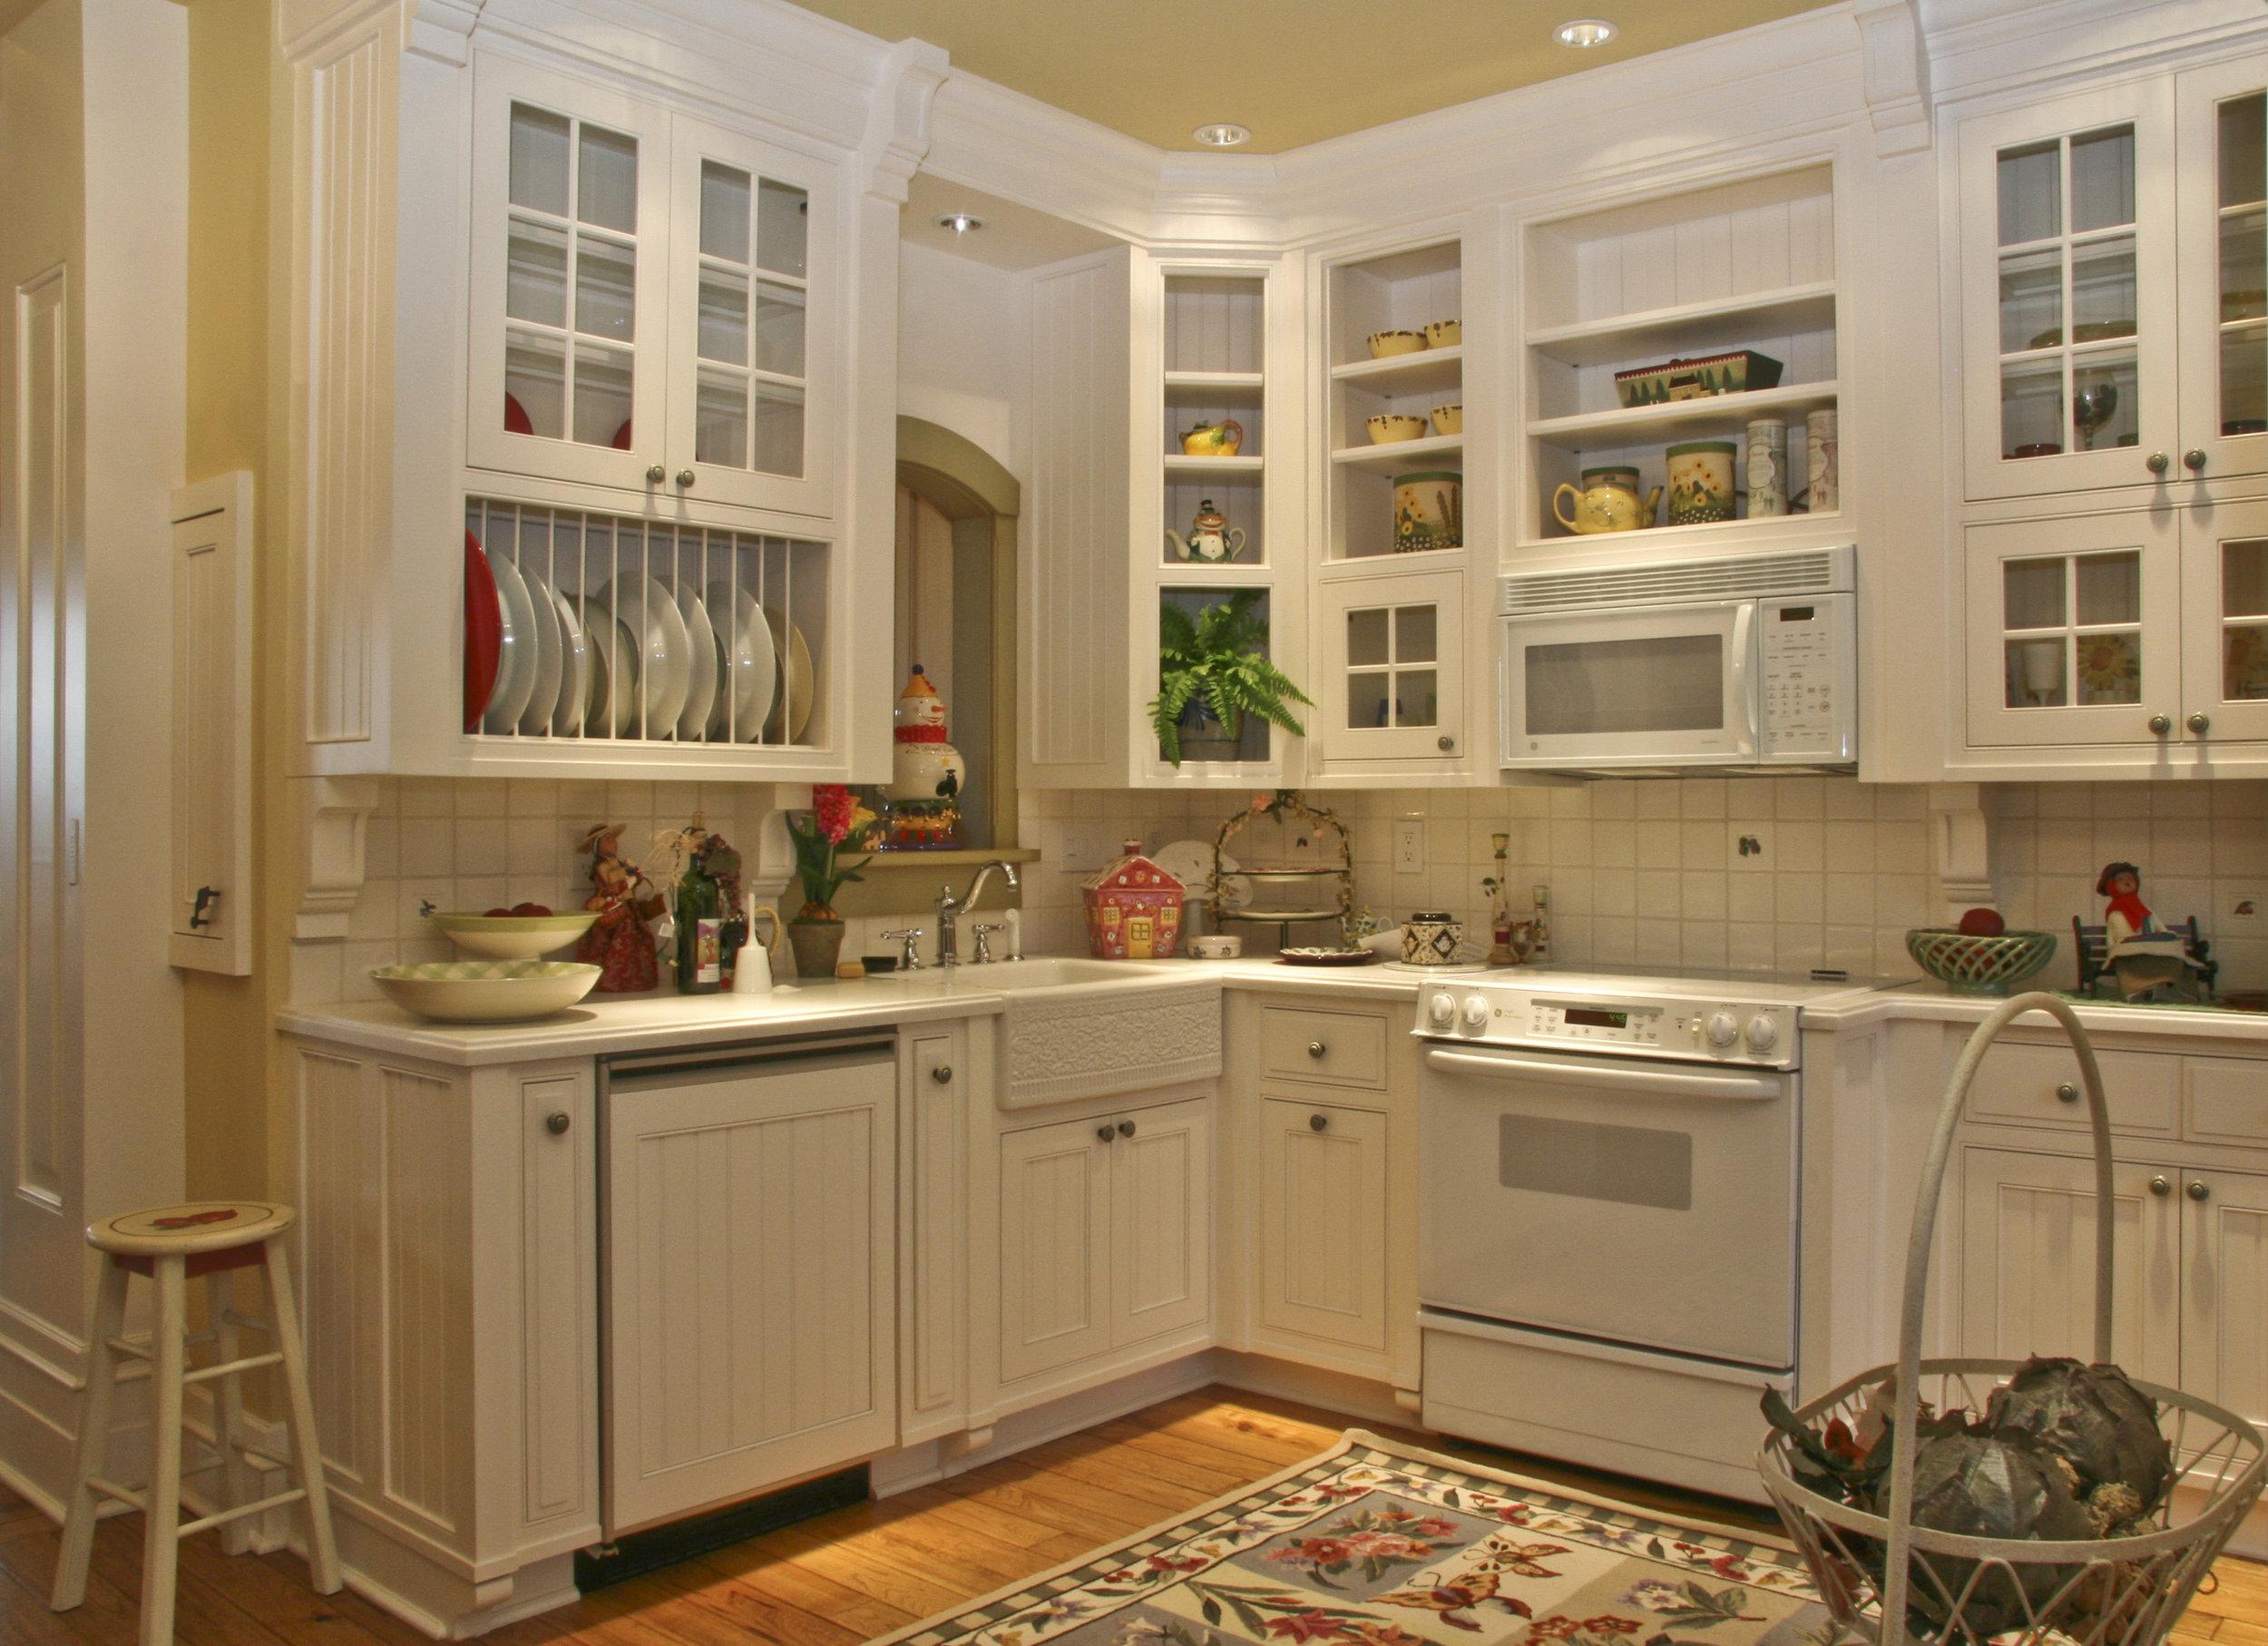 UL Kitchen IMG_2396.jpg